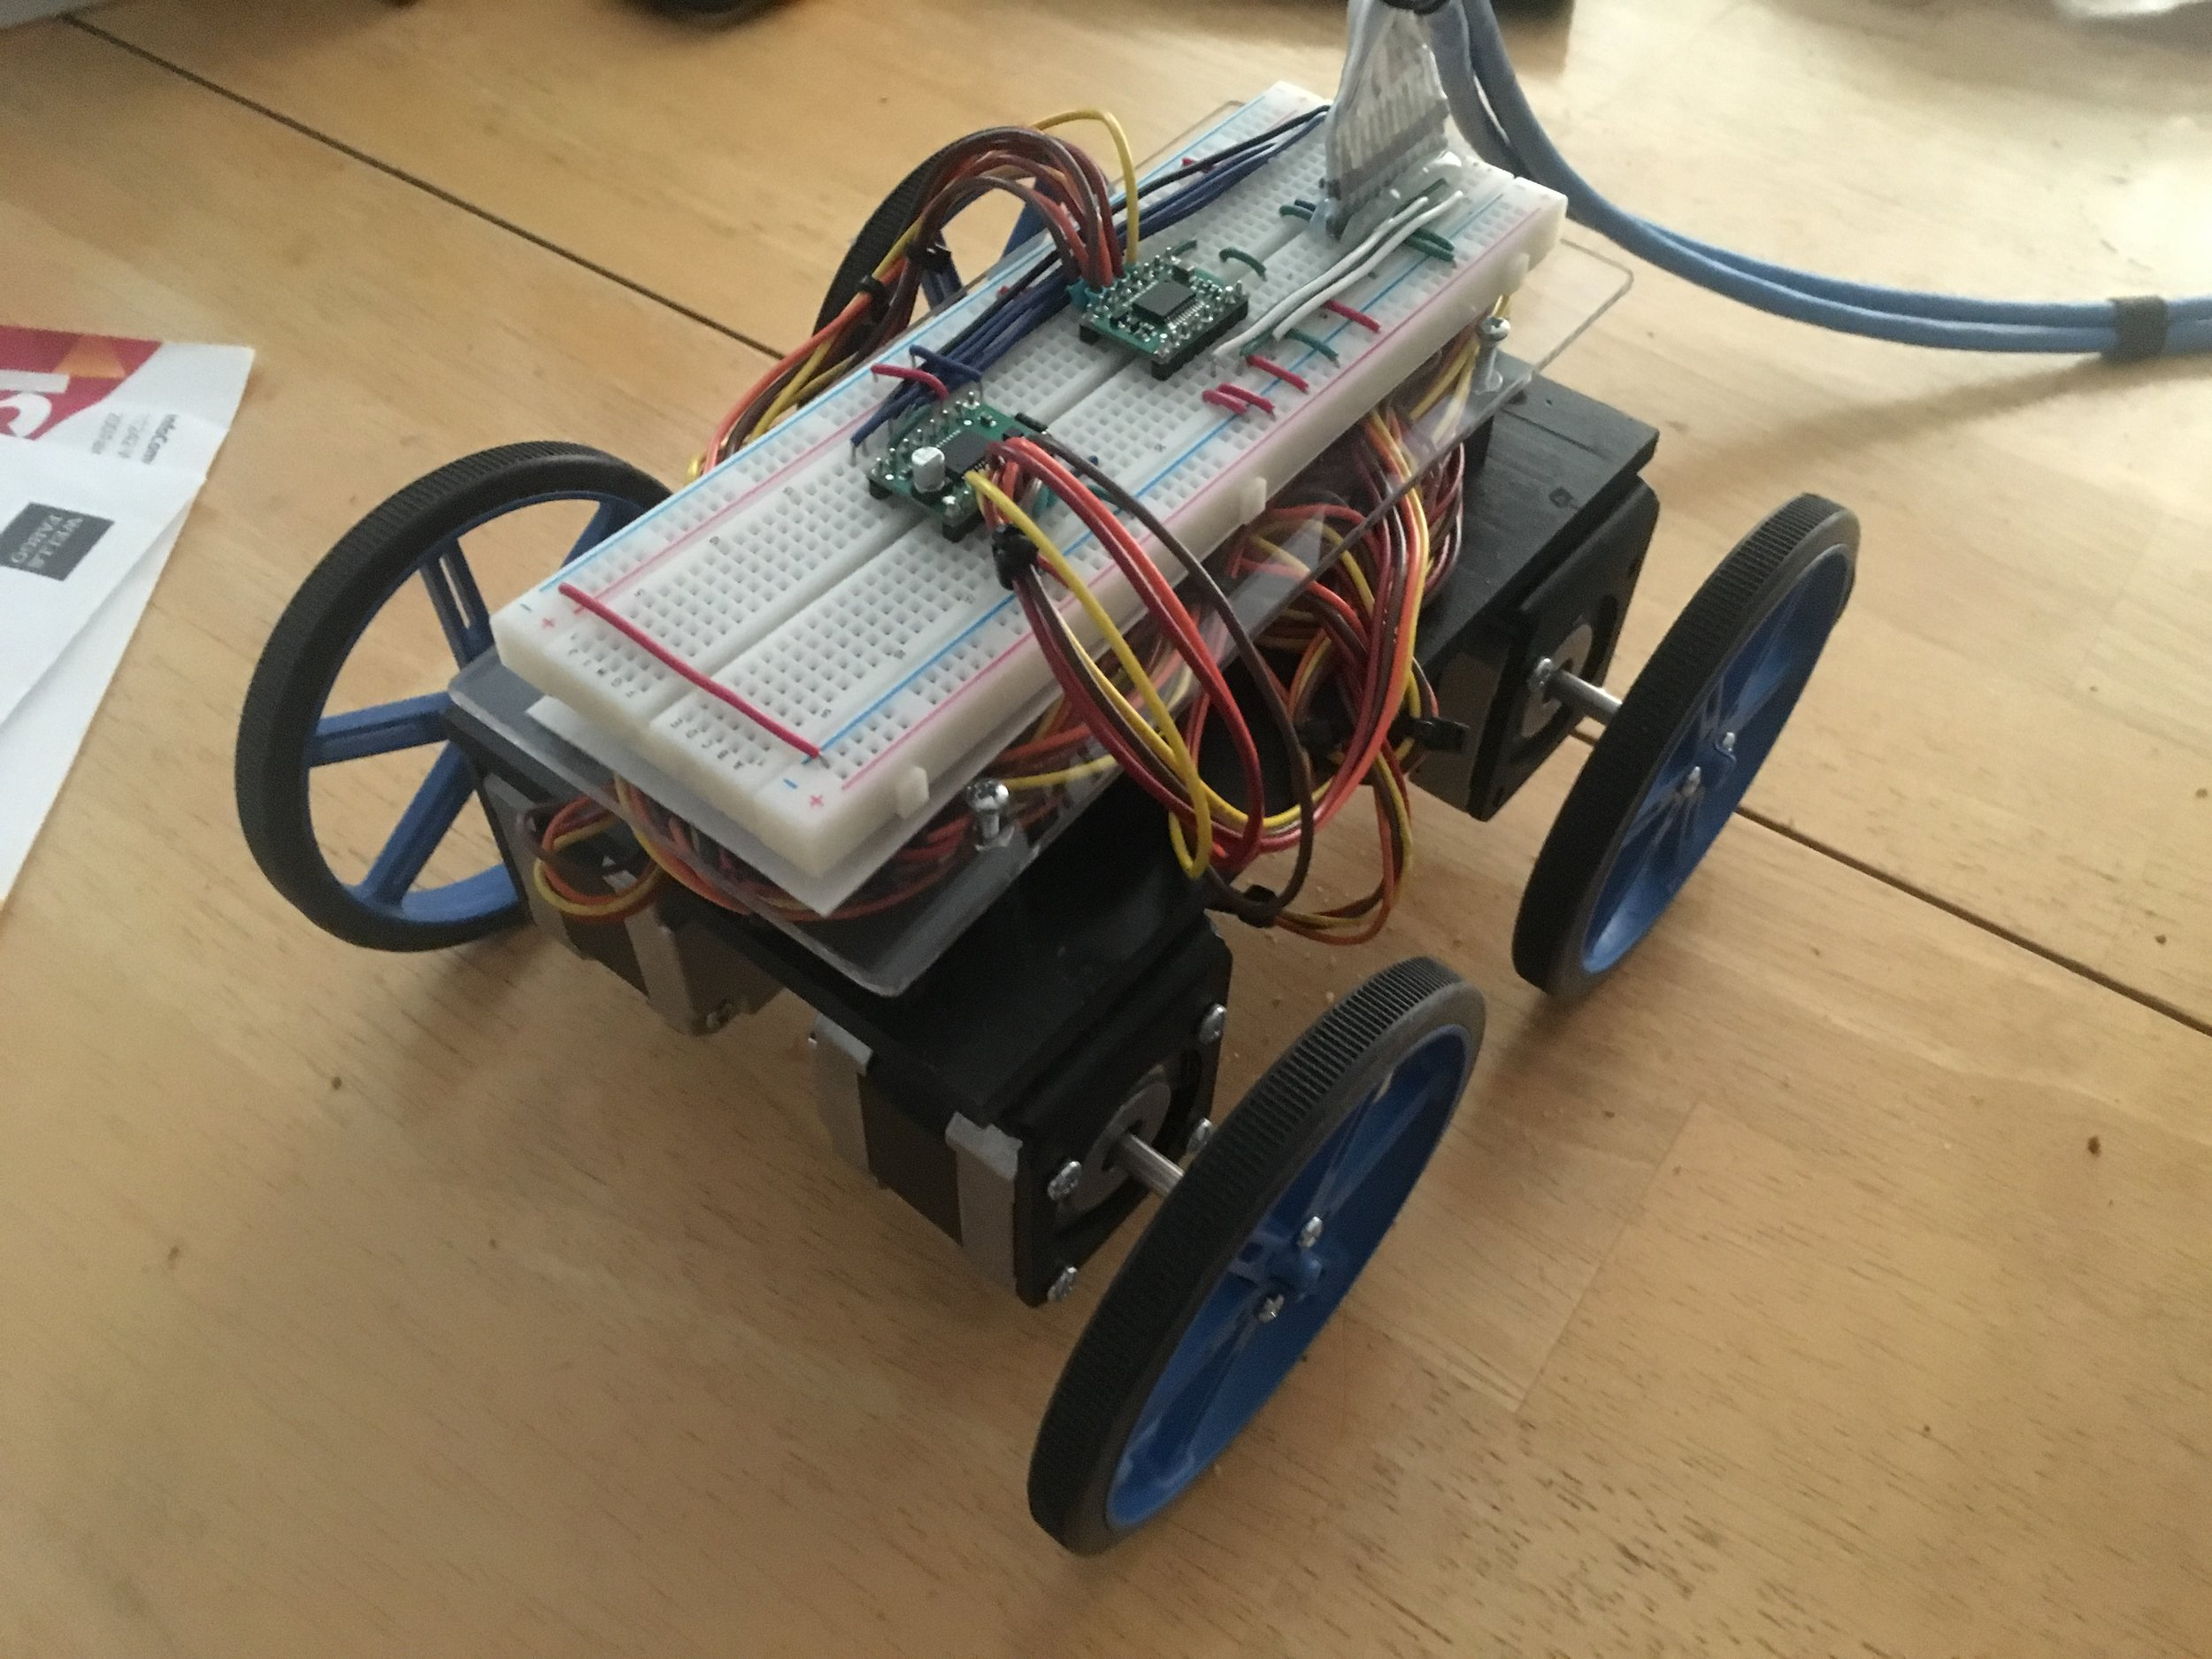 Assembled RC car